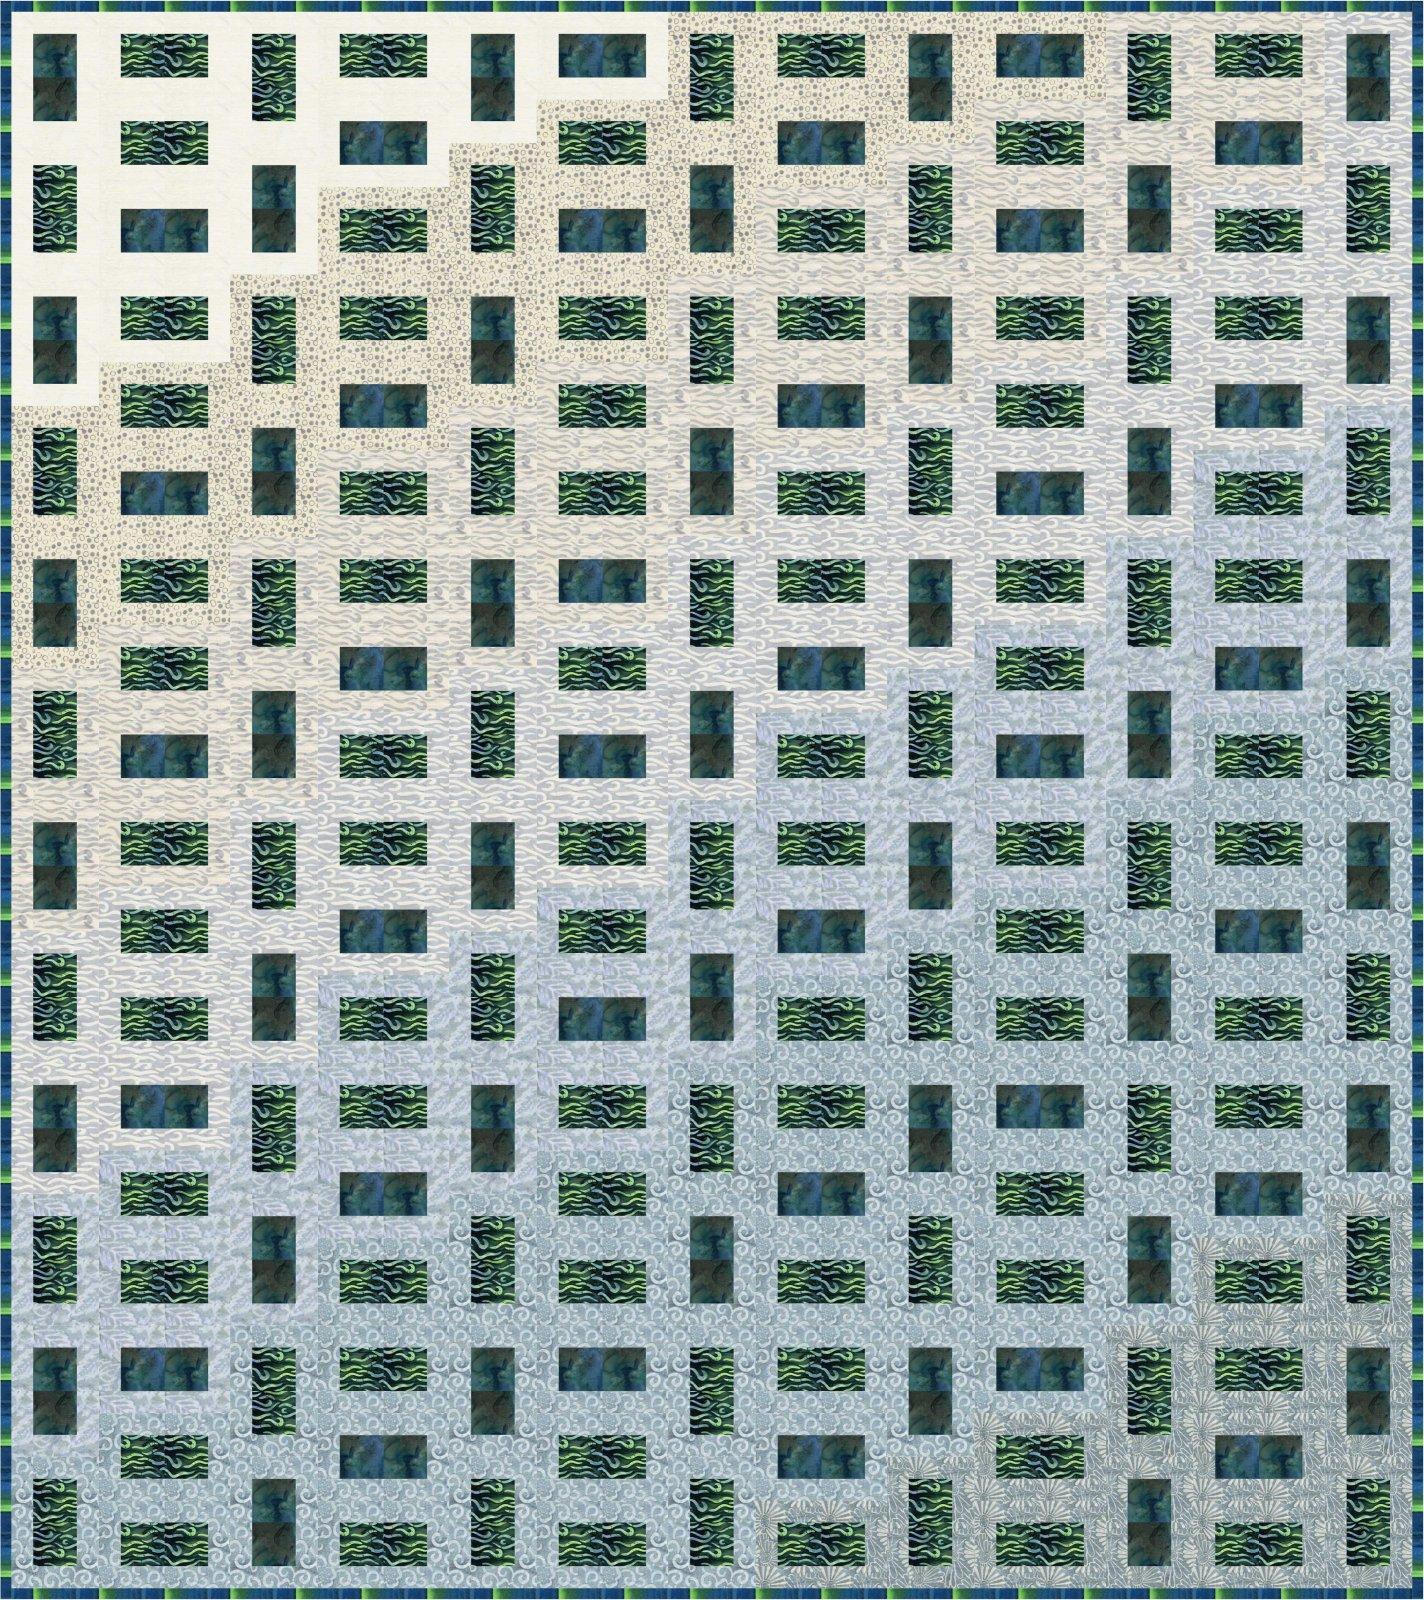 Lapis & Emerald Ripples quilt kit